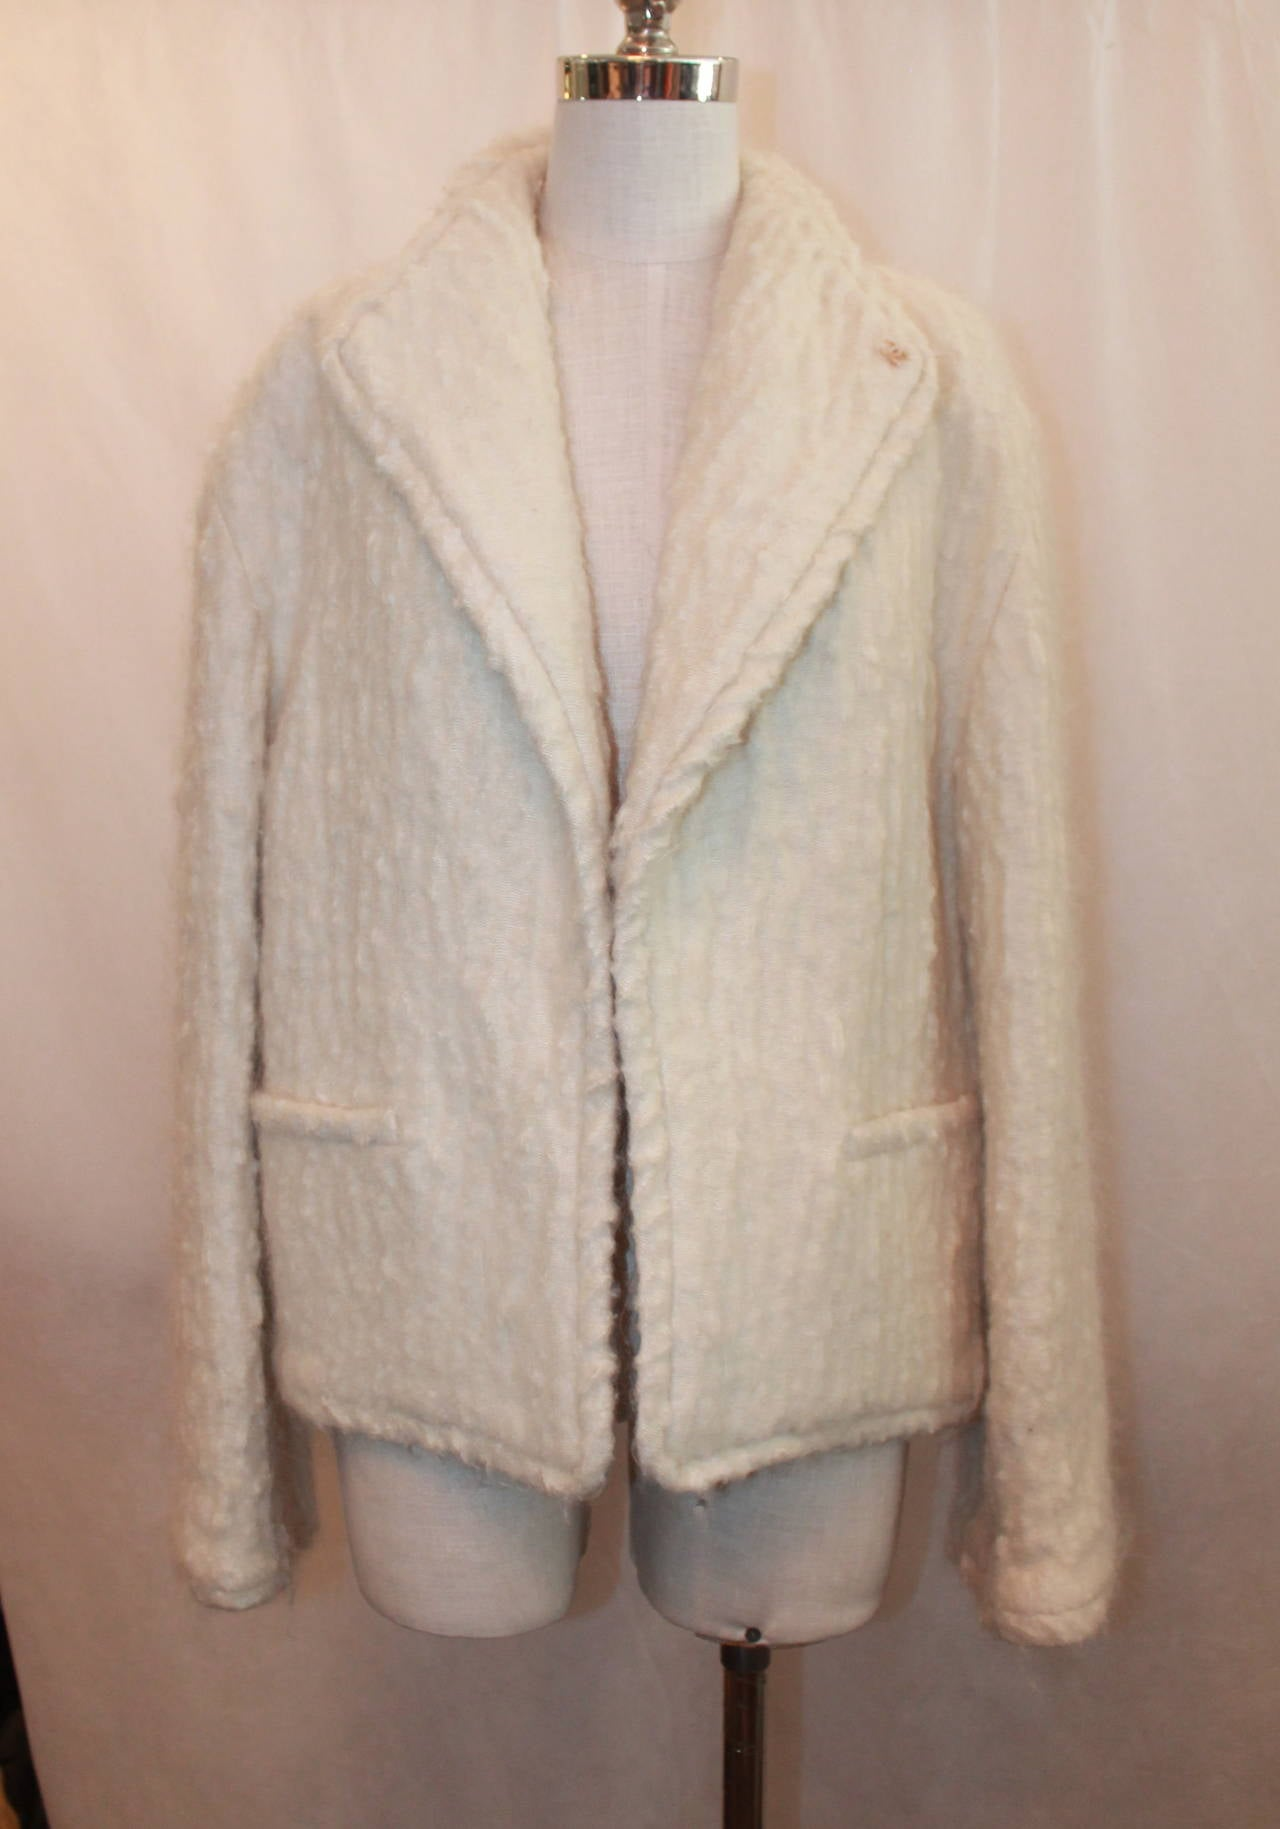 Chanel 1998 Vintage Creme Mohair & Wool Blend Jacket - 38 2